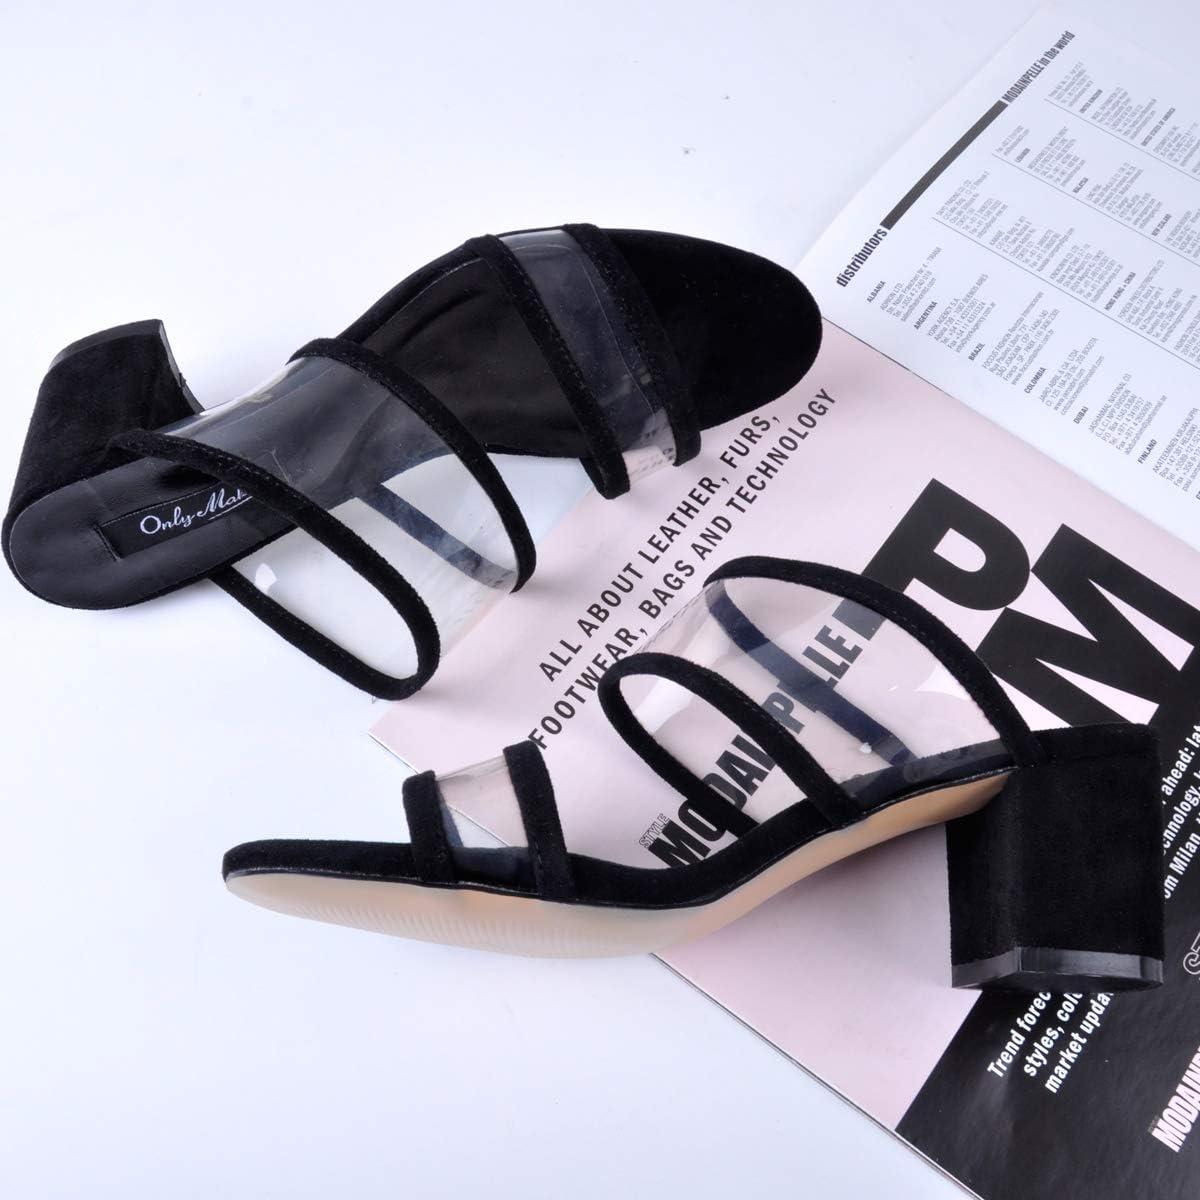 Onlymaker Womens PVC Clear Double Straps Block Heel Slide Sandals Open Toe Slip on Mule Dress Slippers Summer Shoes